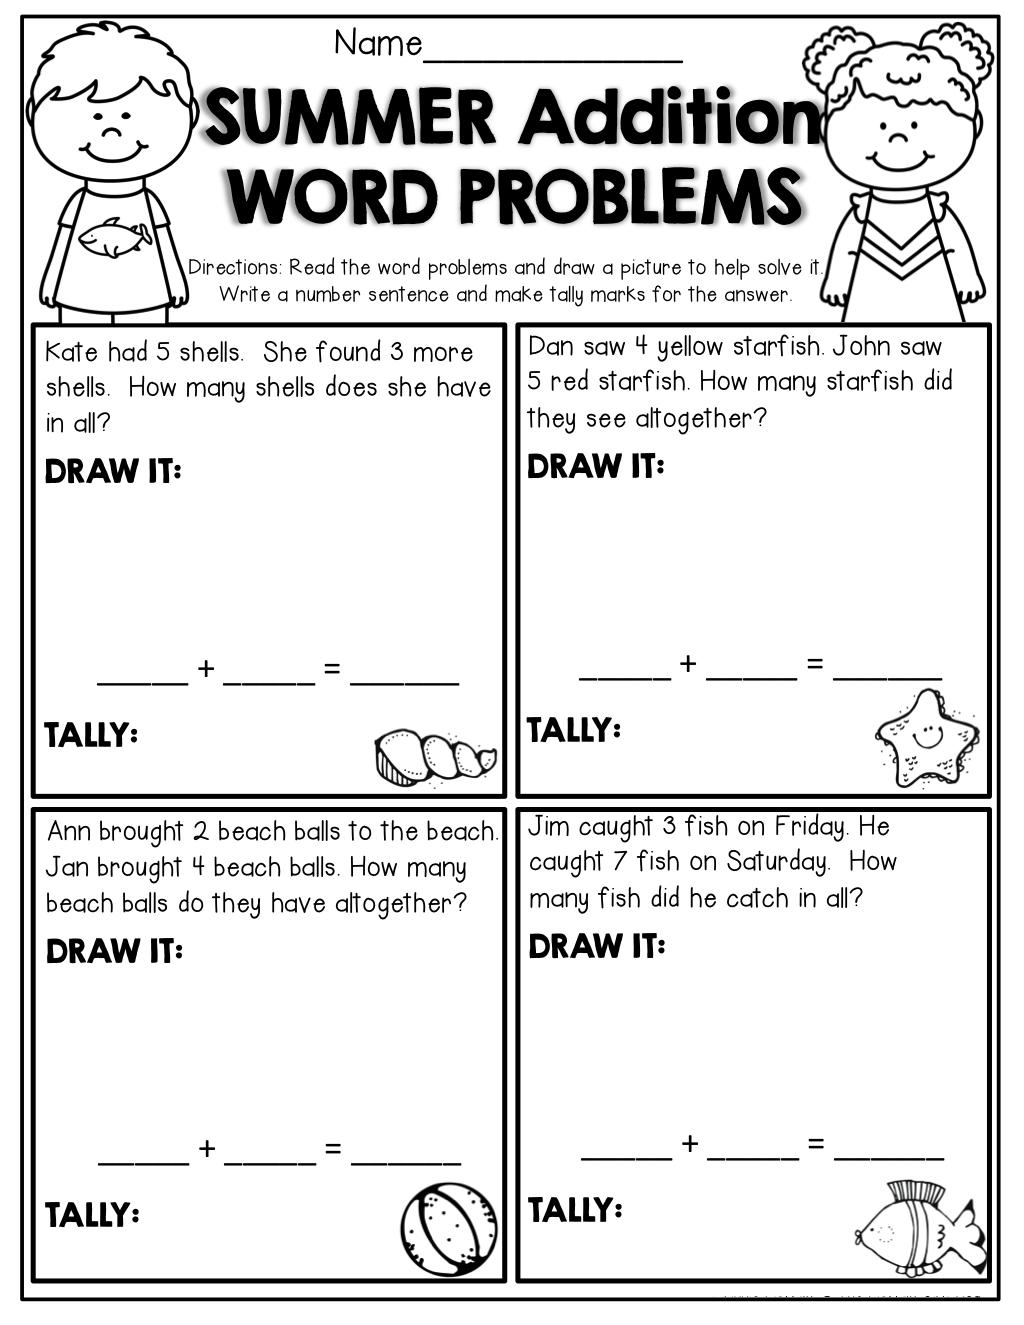 Basic Math Problems Worksheets Word Problems